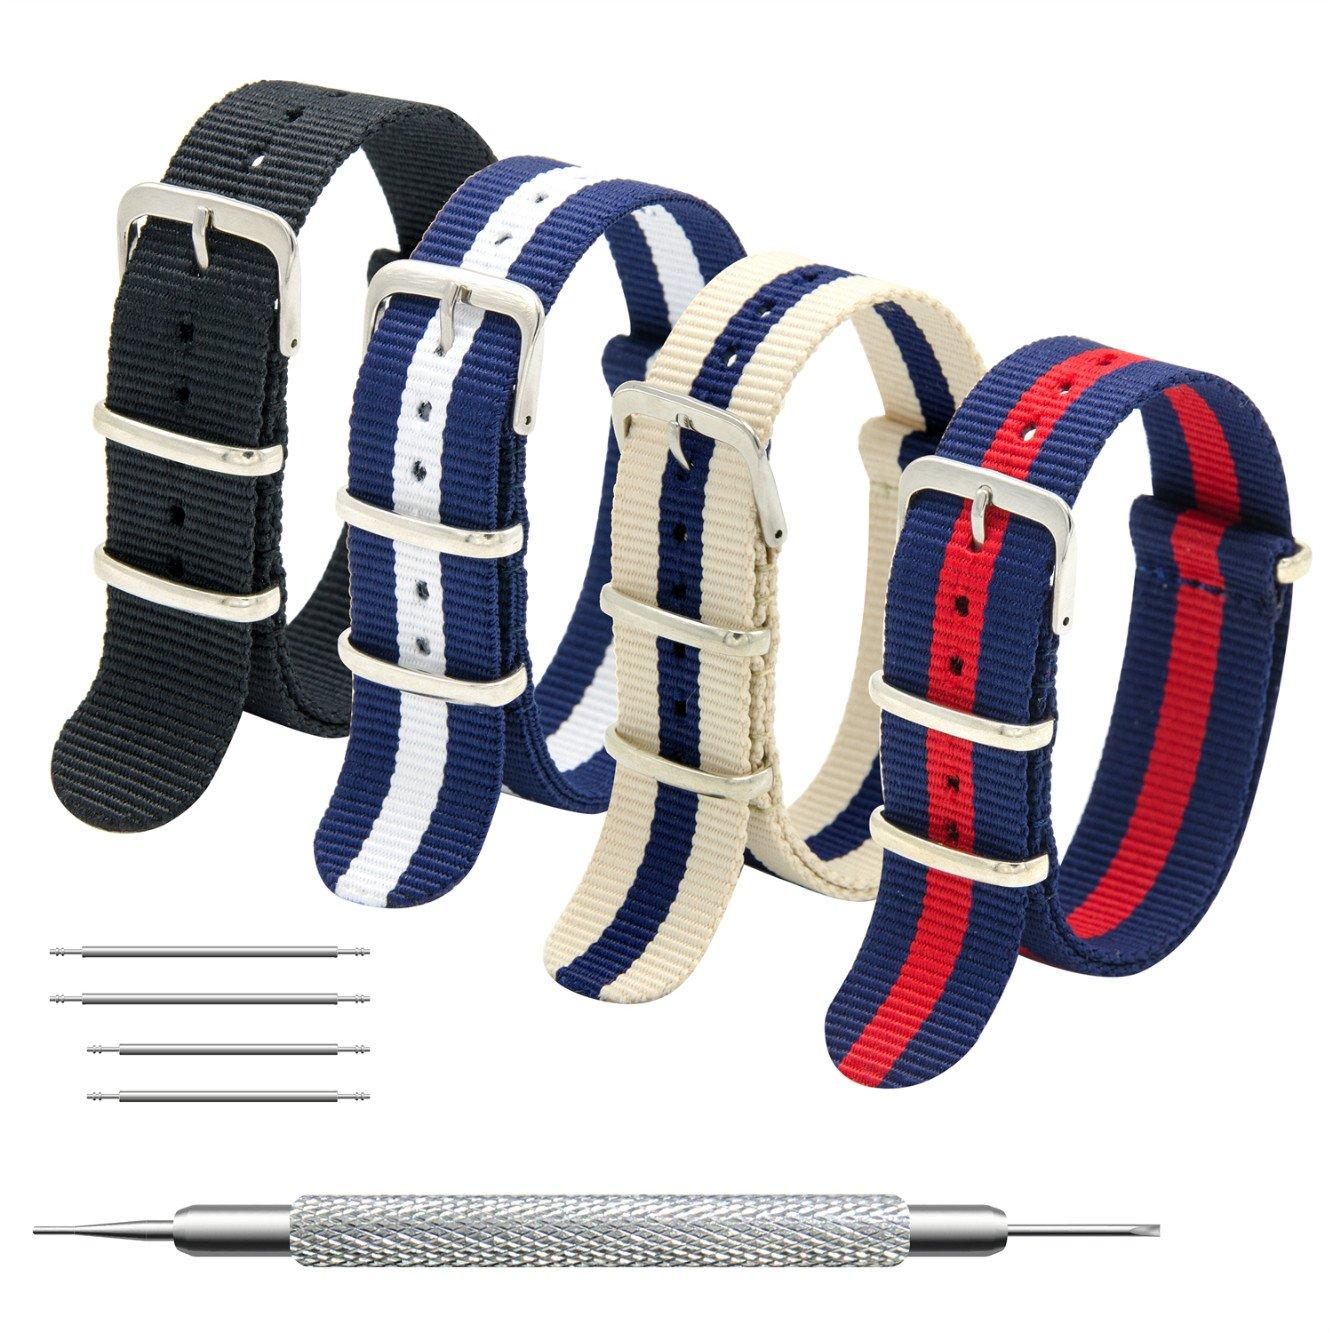 20mm Uhrenarmband Schwarz Kunststoff-PVC Band Top Qualität Länge L  Angebot